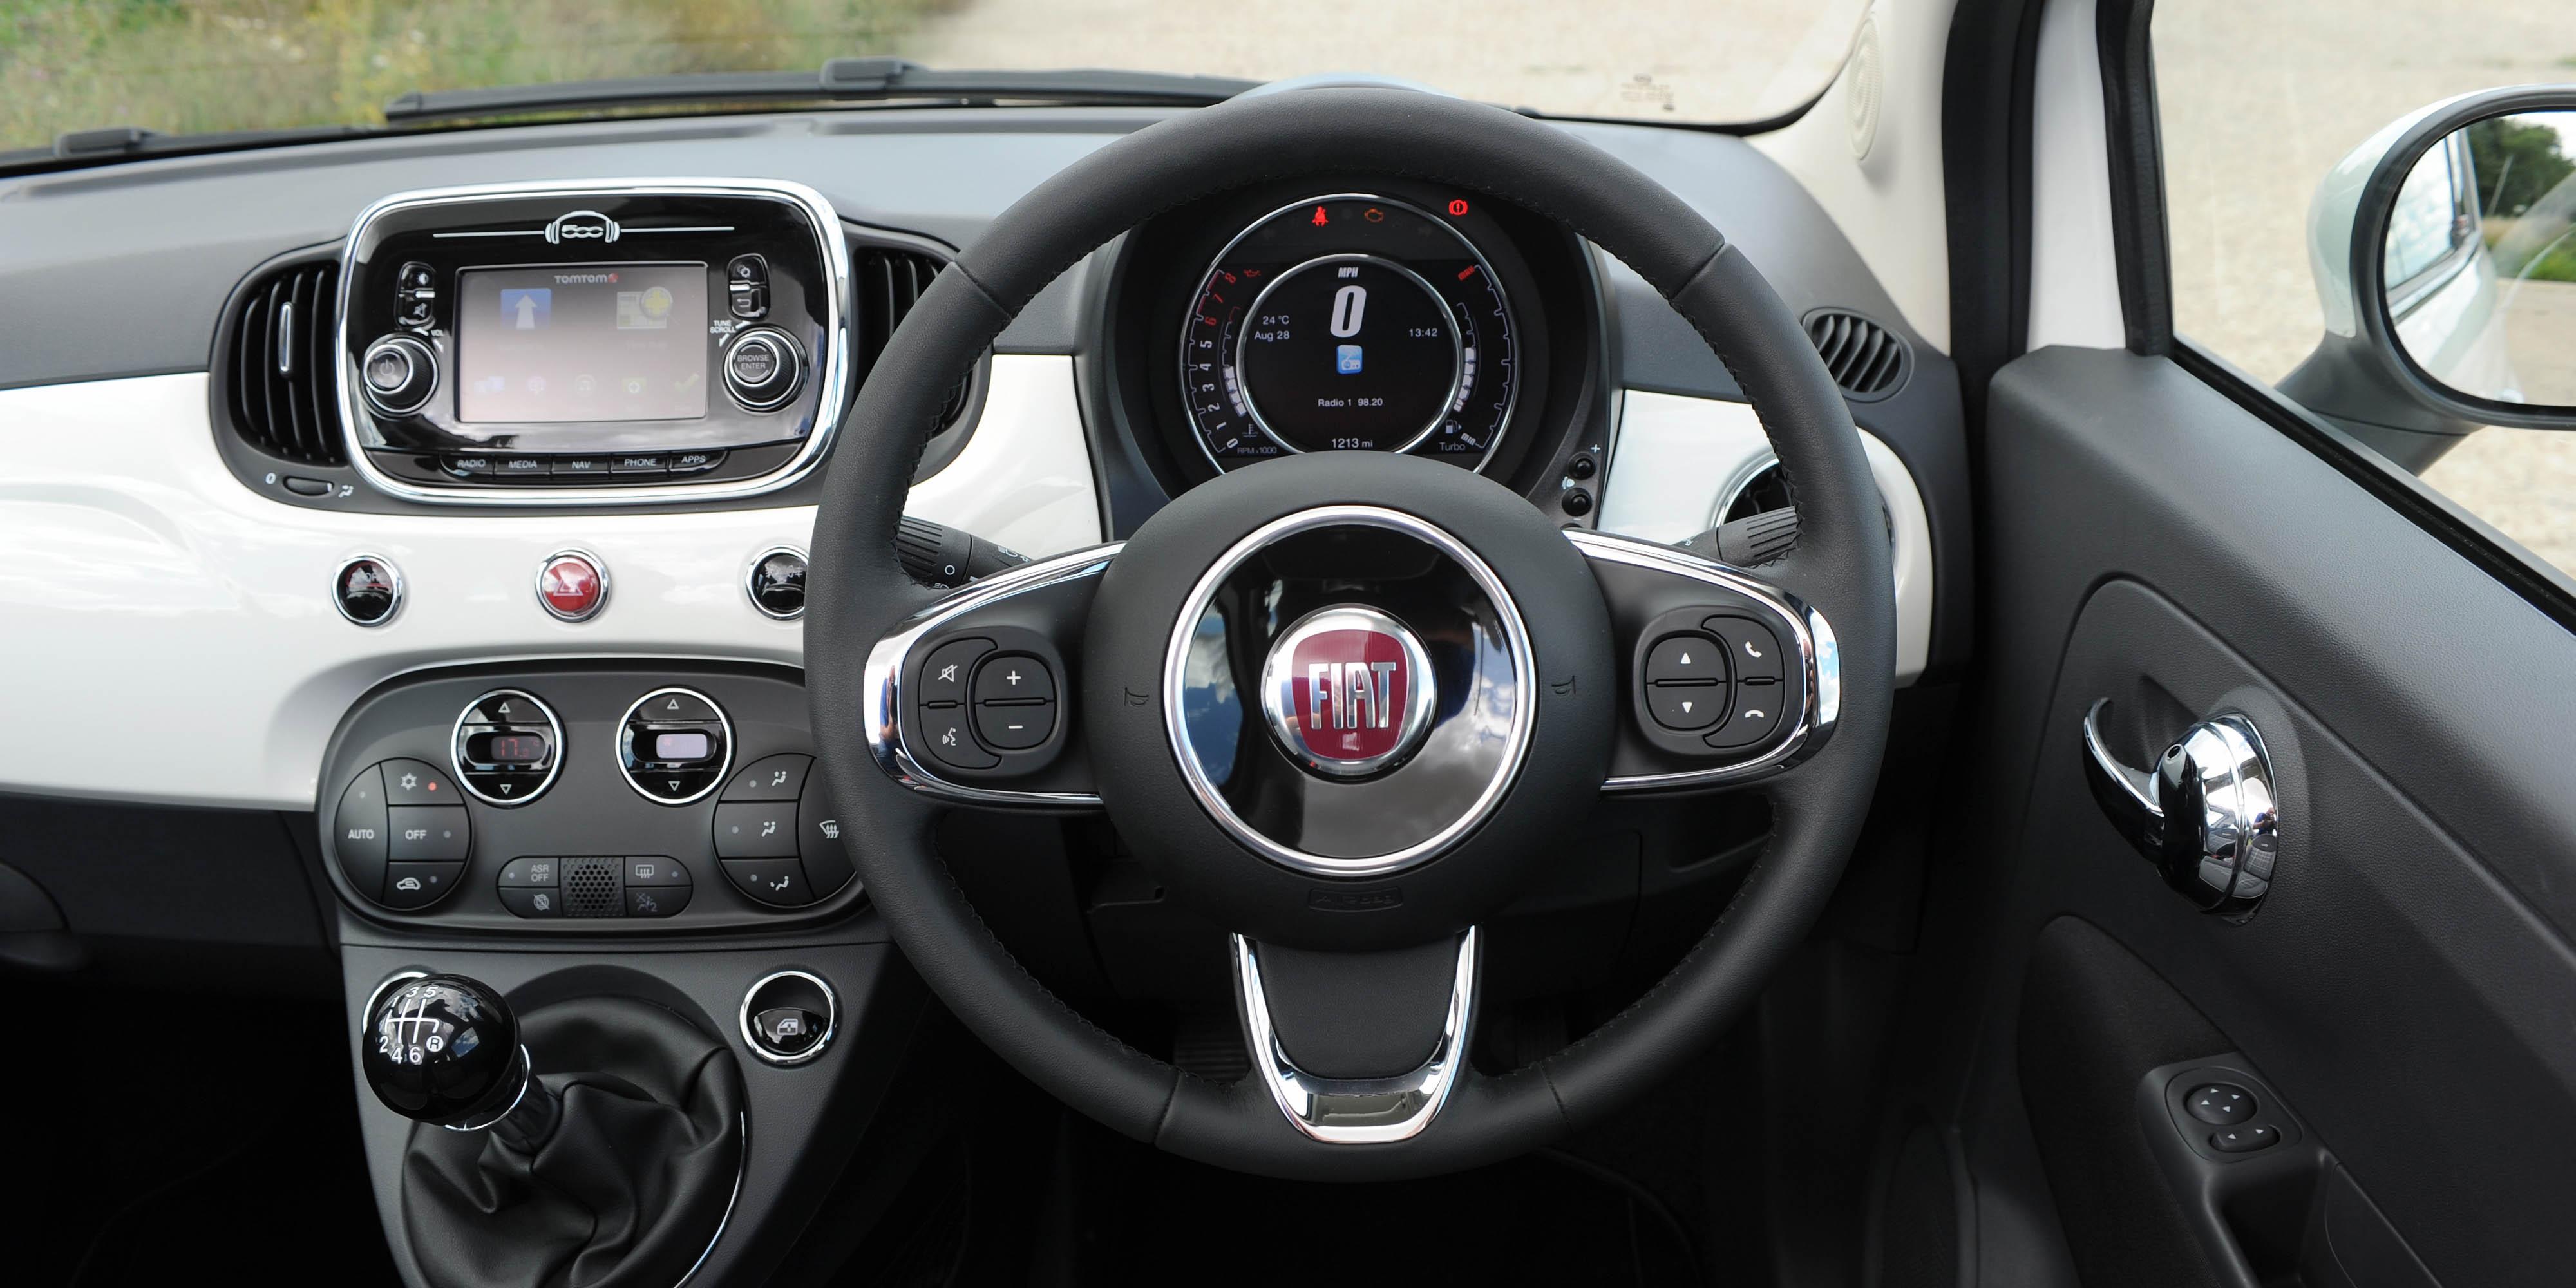 New Fiat 500 Interior & Infotainment | carwow #FR68